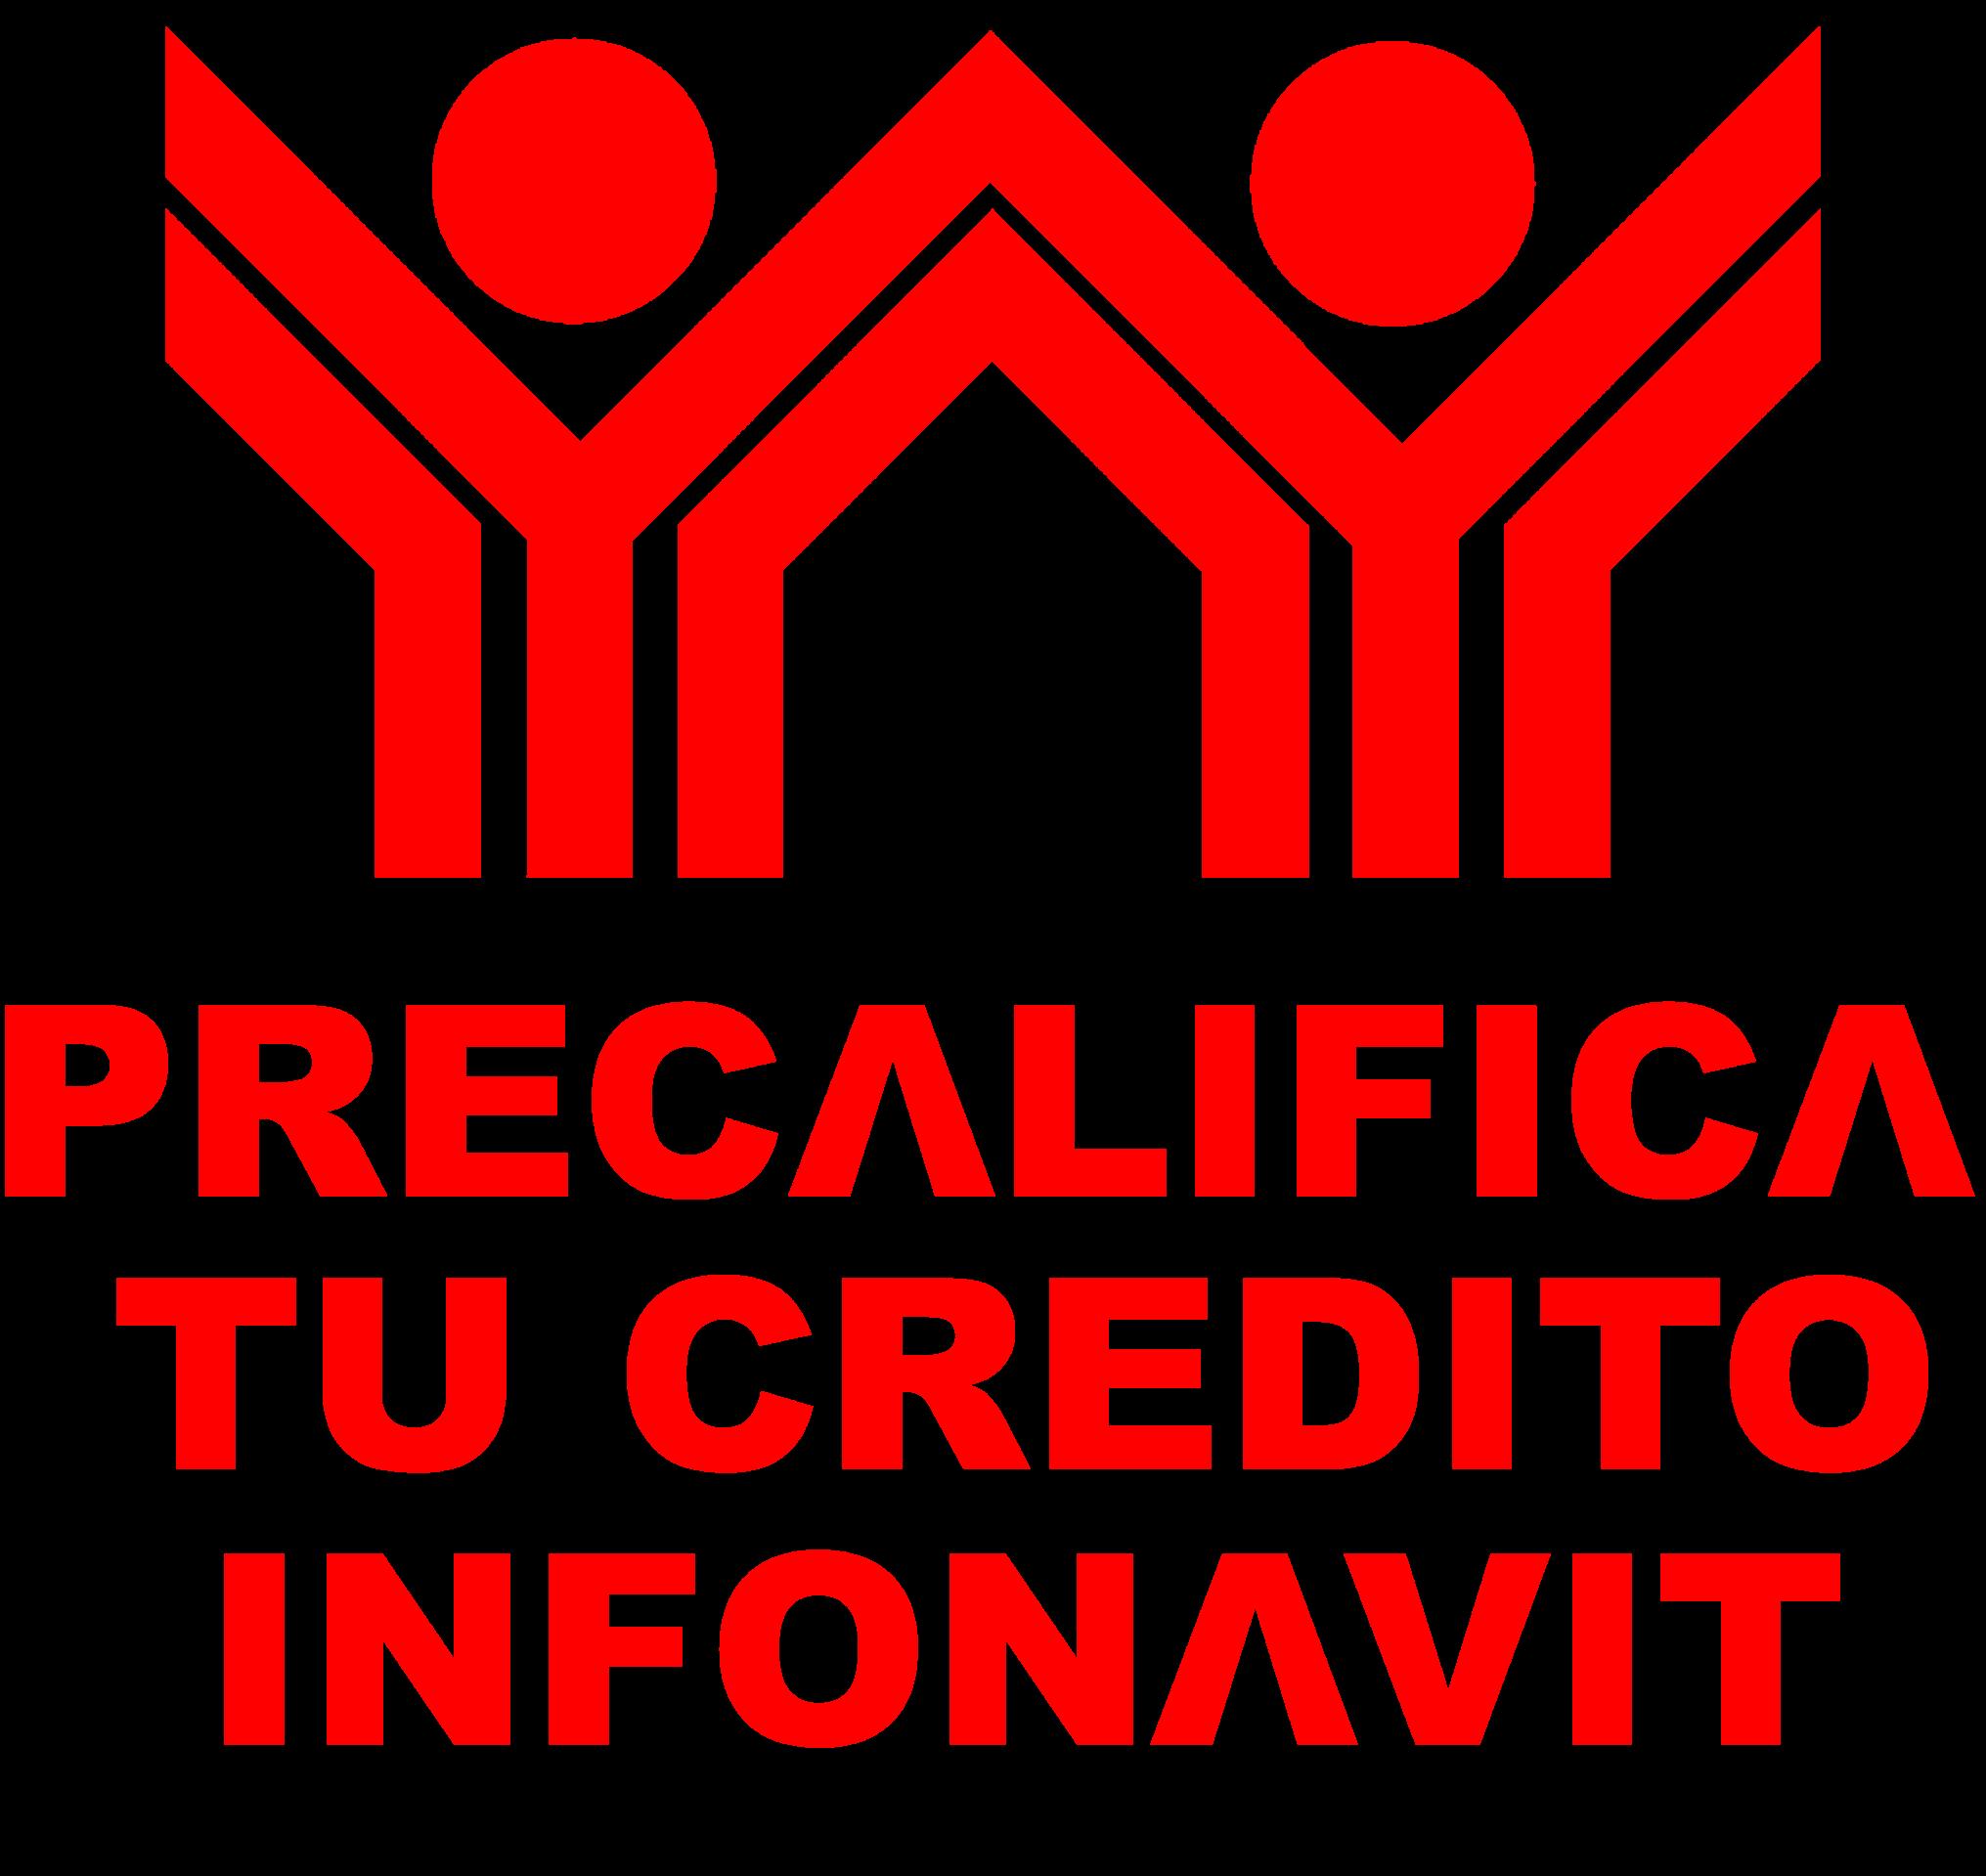 INFONAVIT PRECALIFICA TU CREDITO